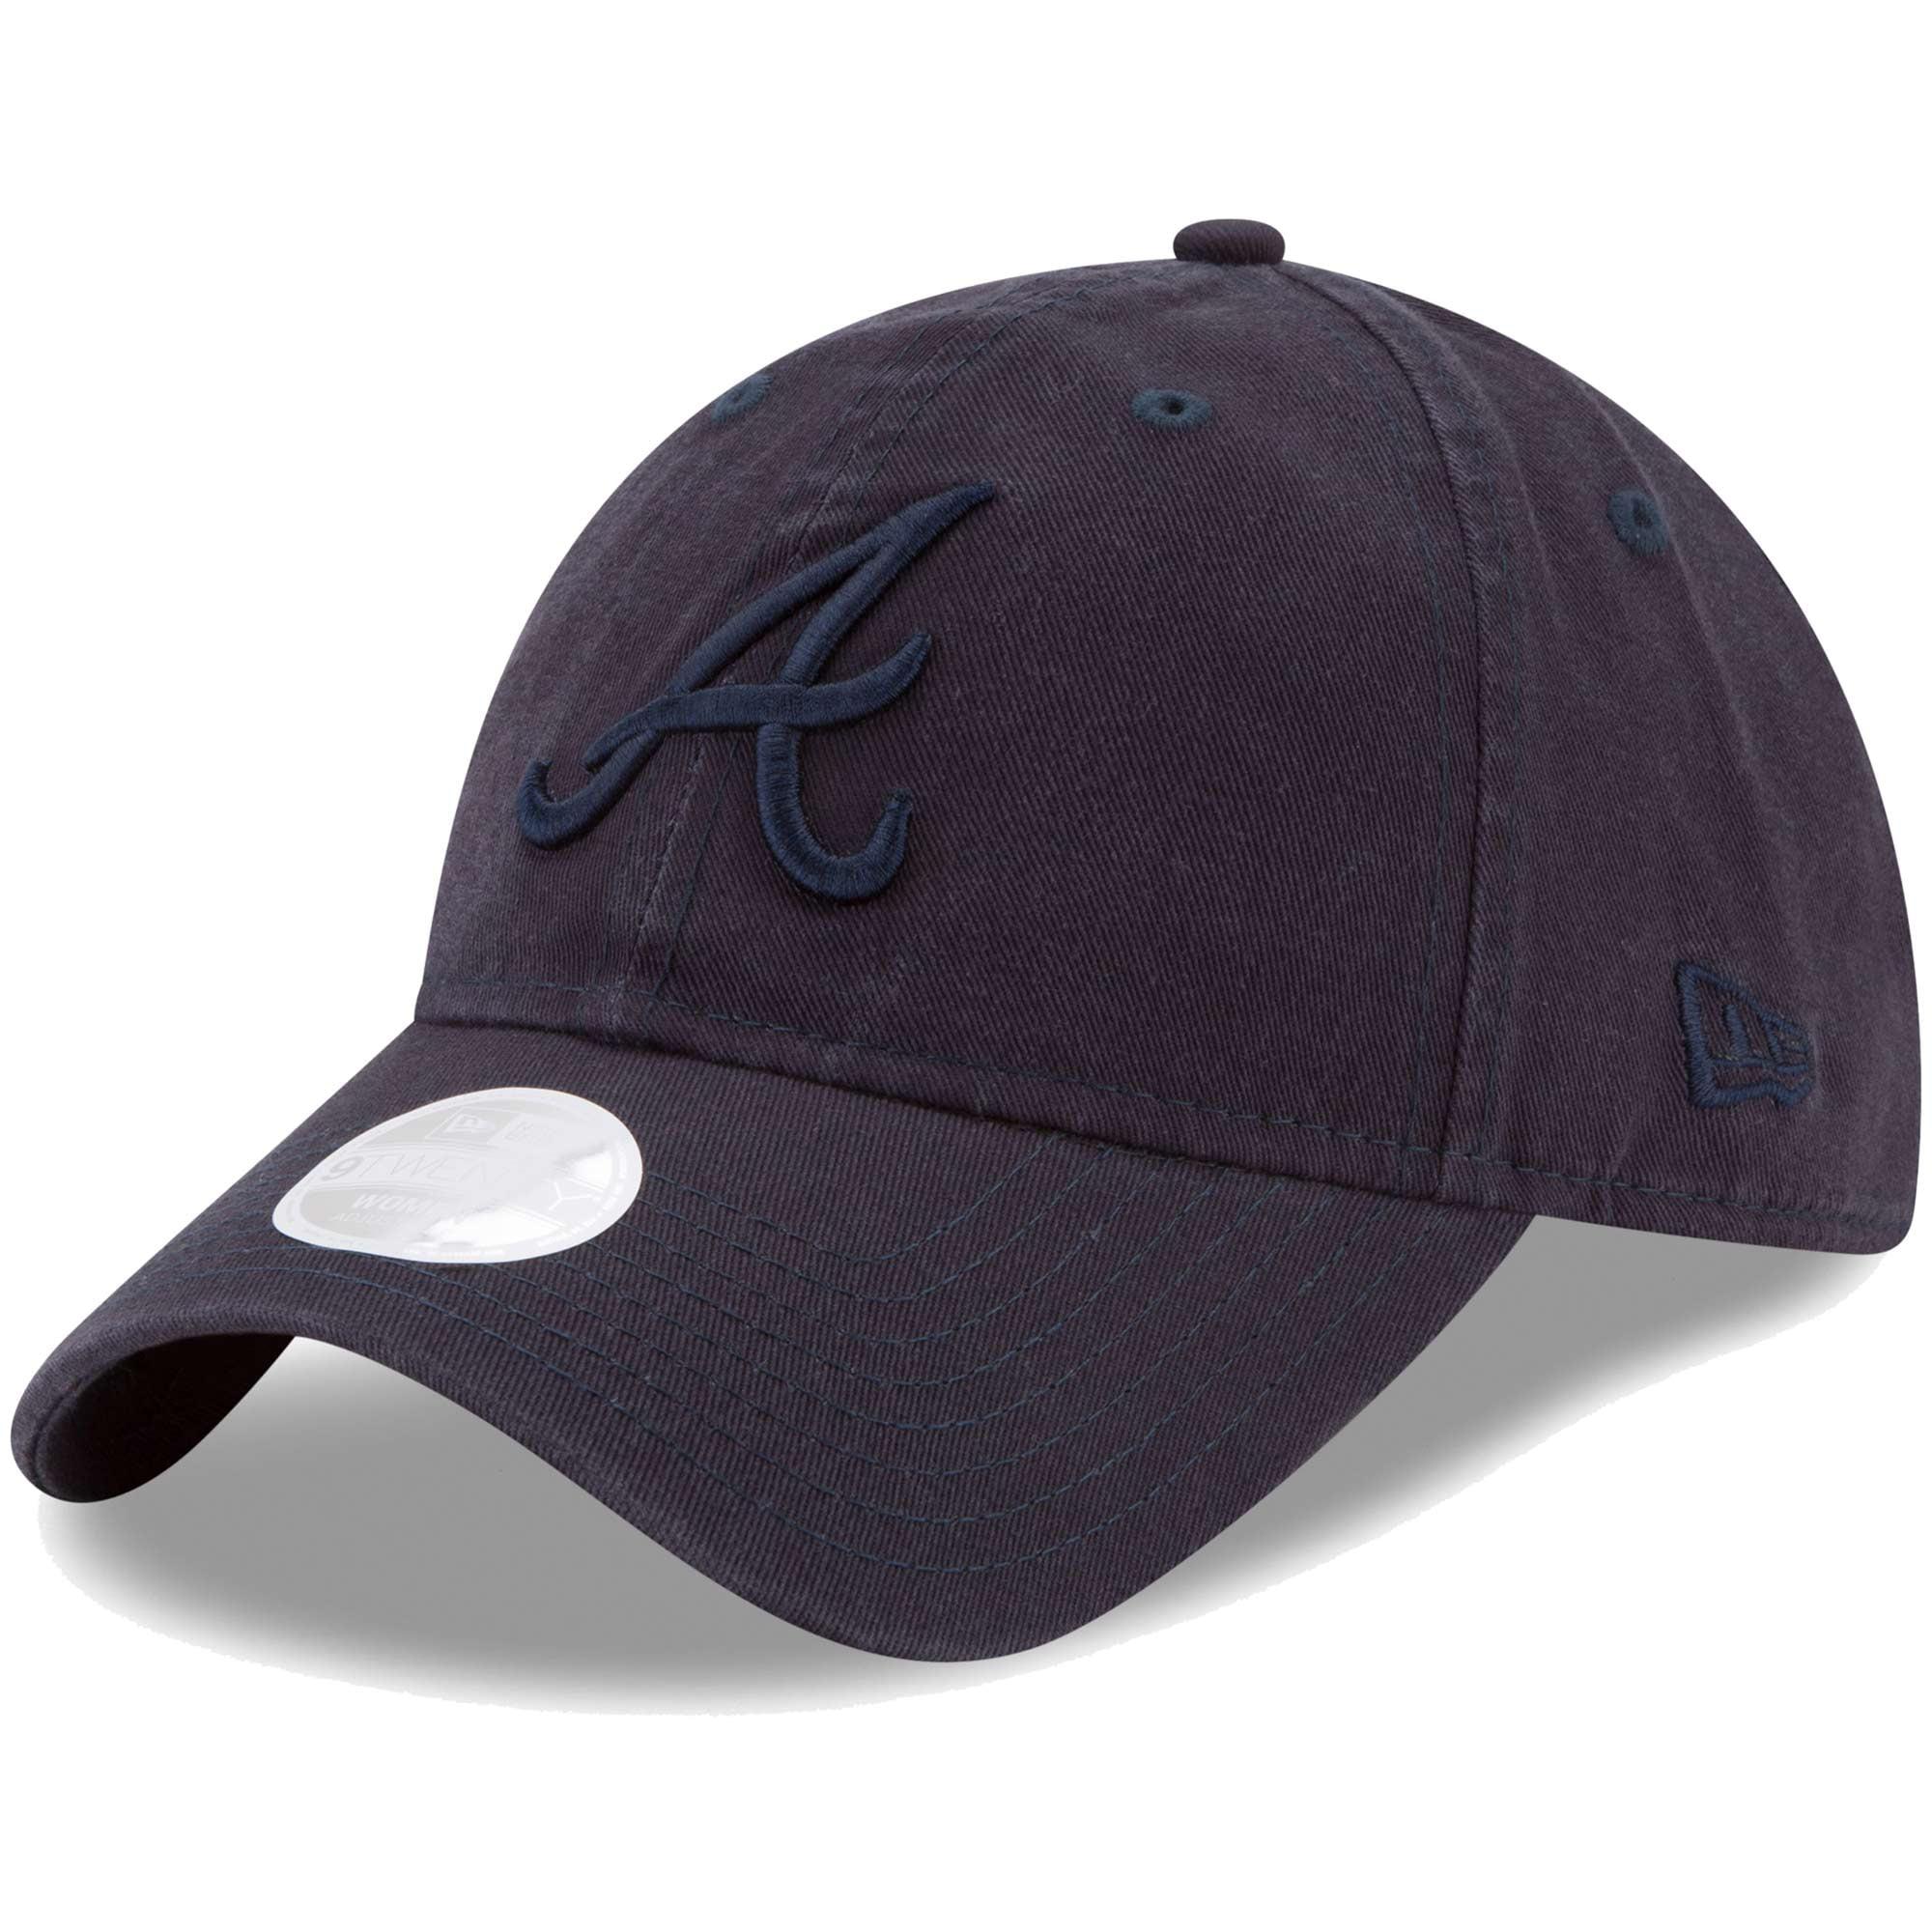 Atlanta Braves New Era Women's Preferred Pick Tonal 9TWENTY Adjustable Hat - Navy - OSFA